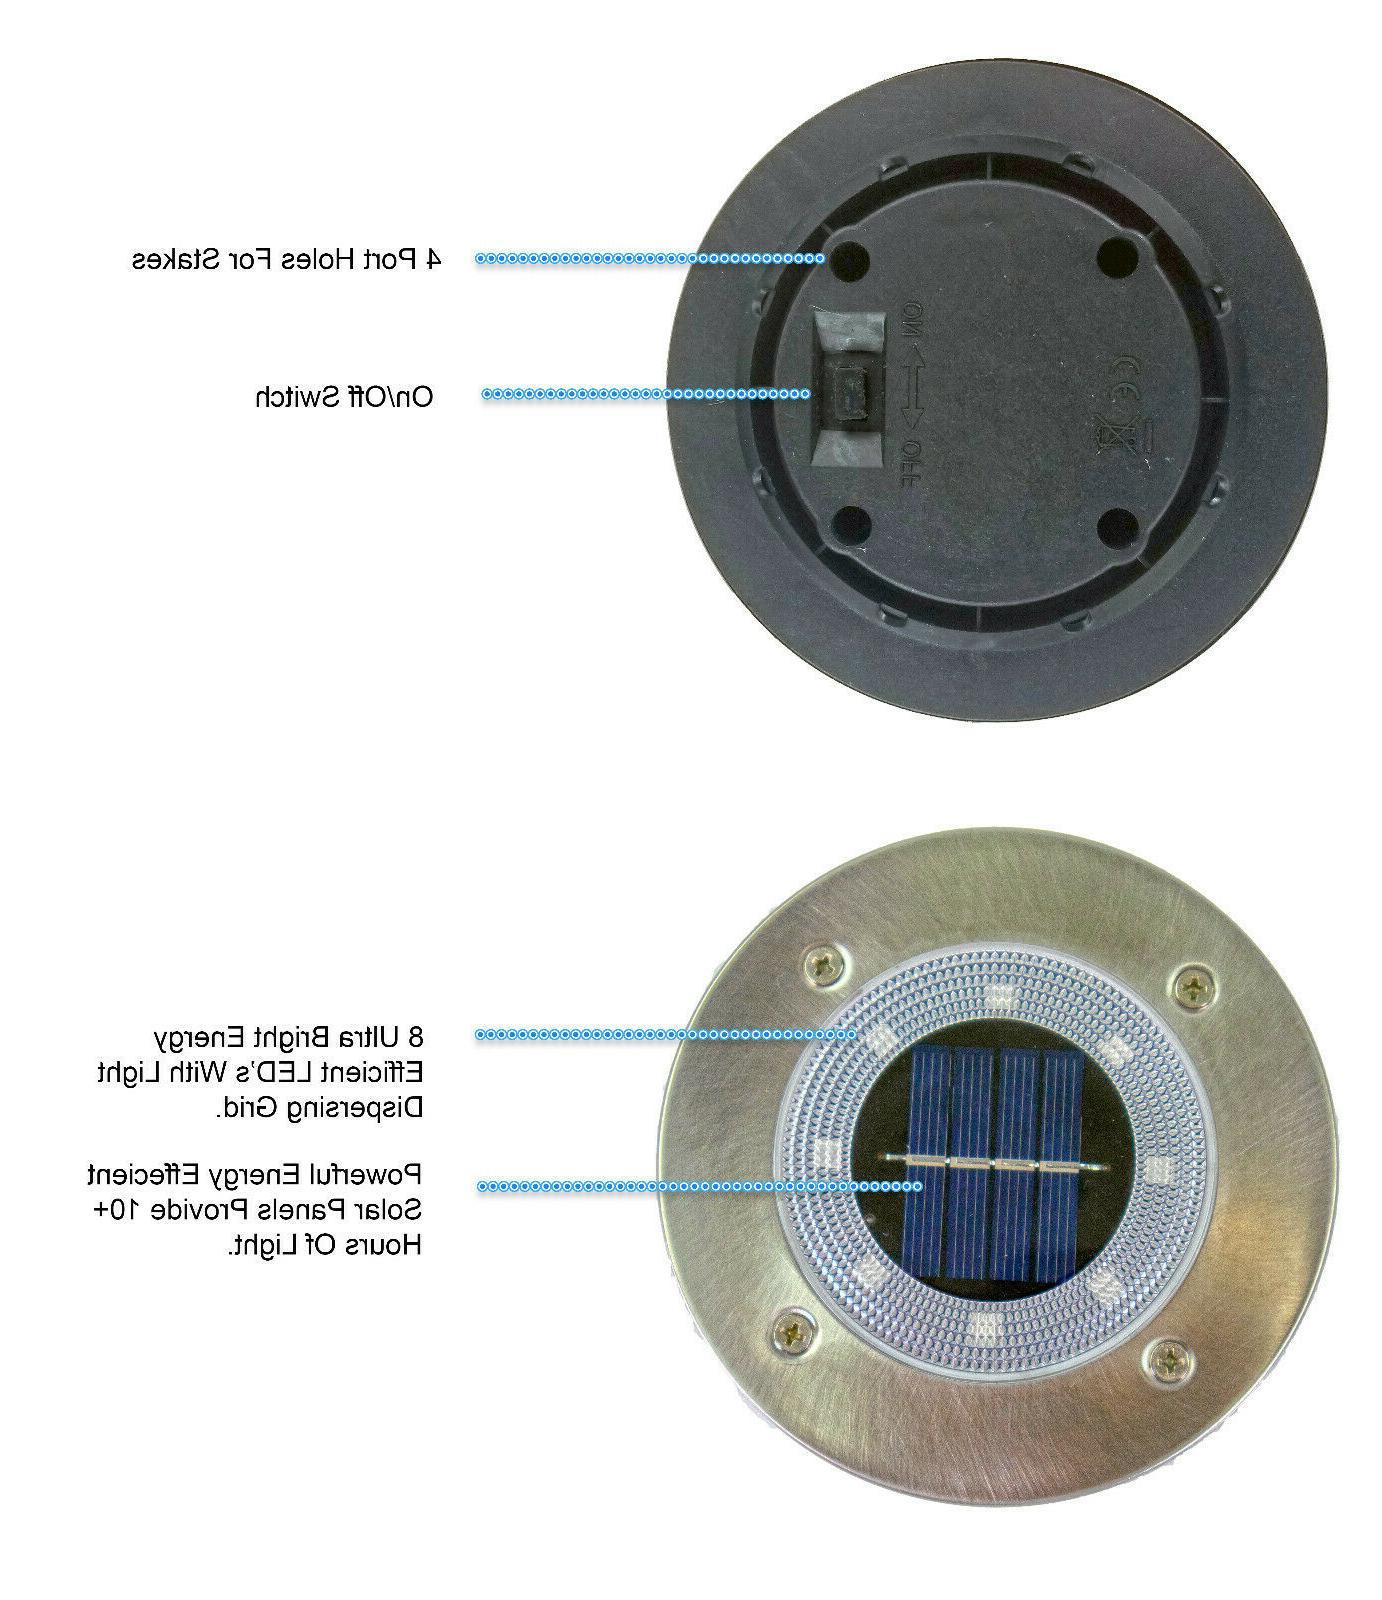 4 Solar Powered LED Disc Path Lights Diffusure Lens Waterproof Disk